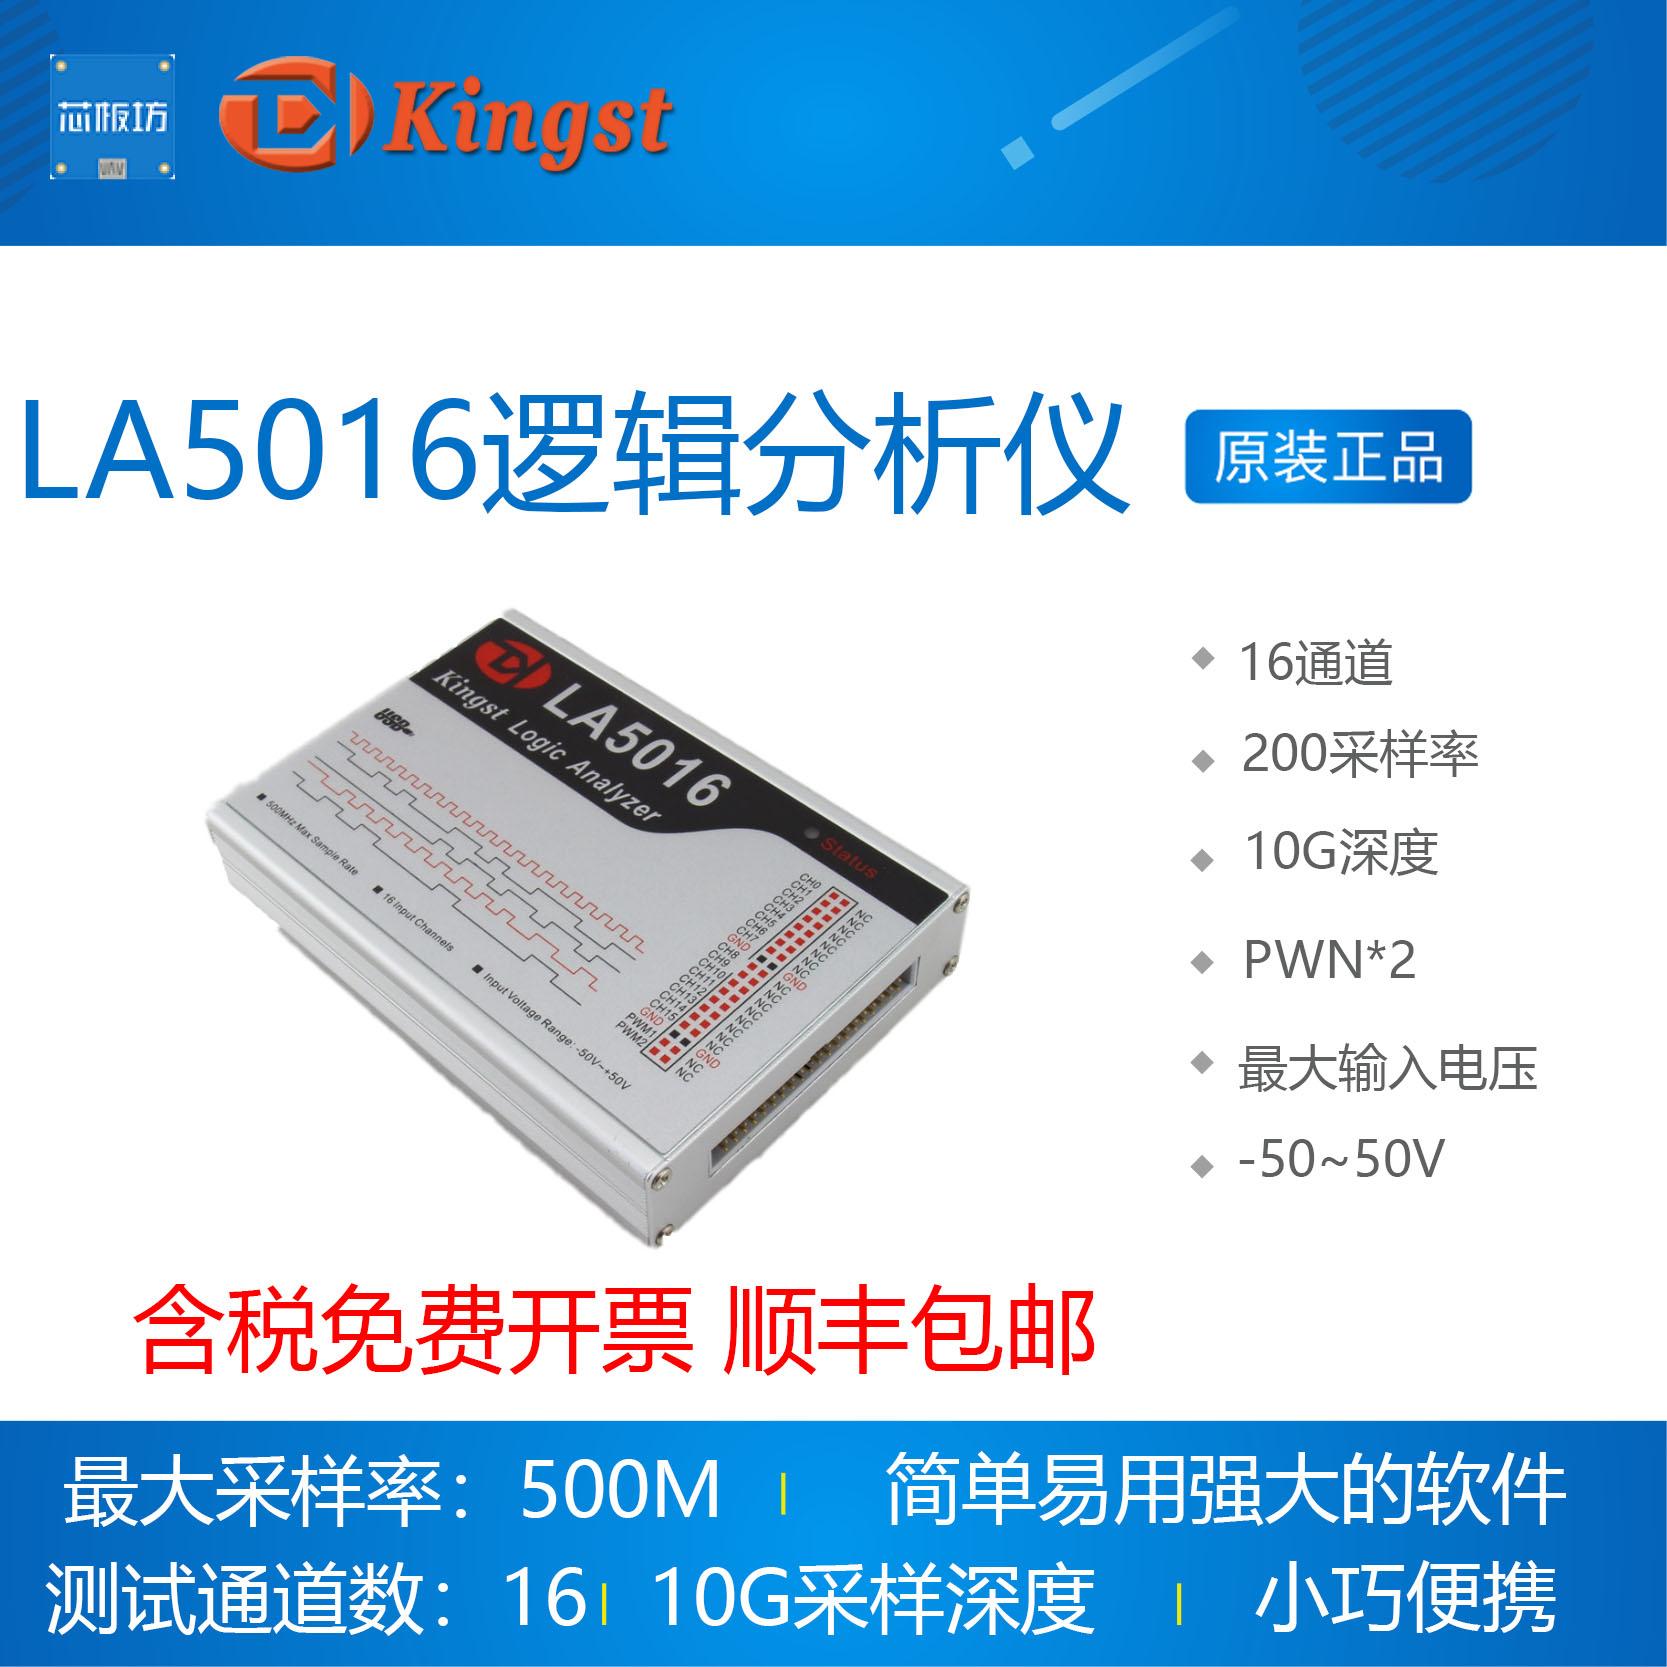 Kingst LA5016 usb 逻辑分析仪 16路全通道 500M采样率 分析仪